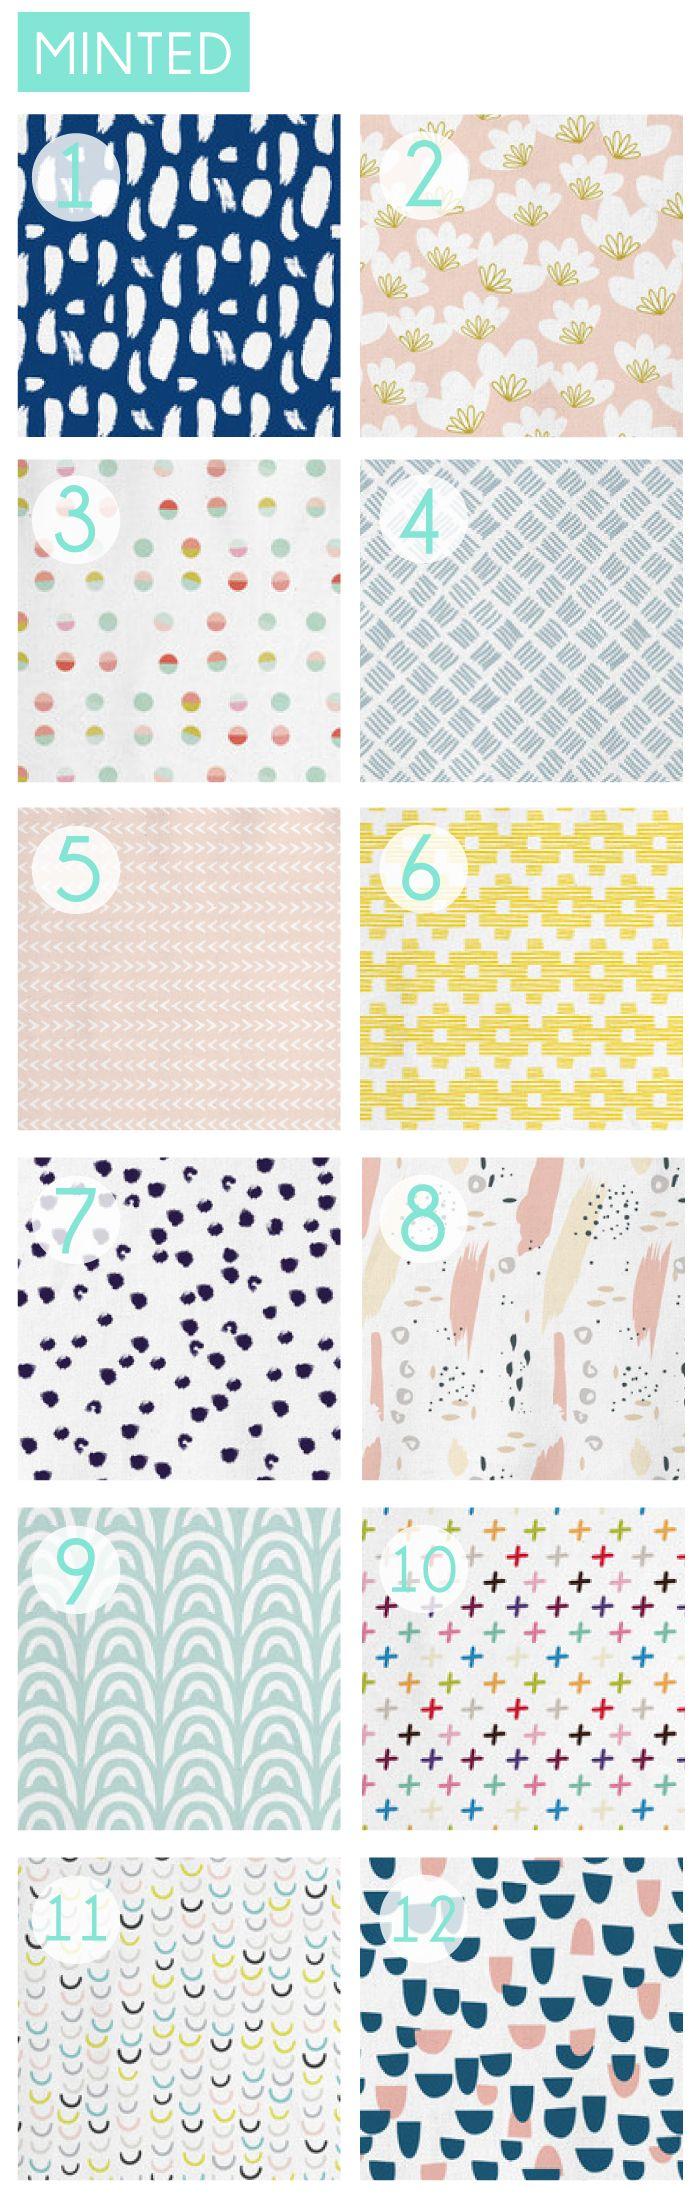 Best online fabric sources via Emily Henderson